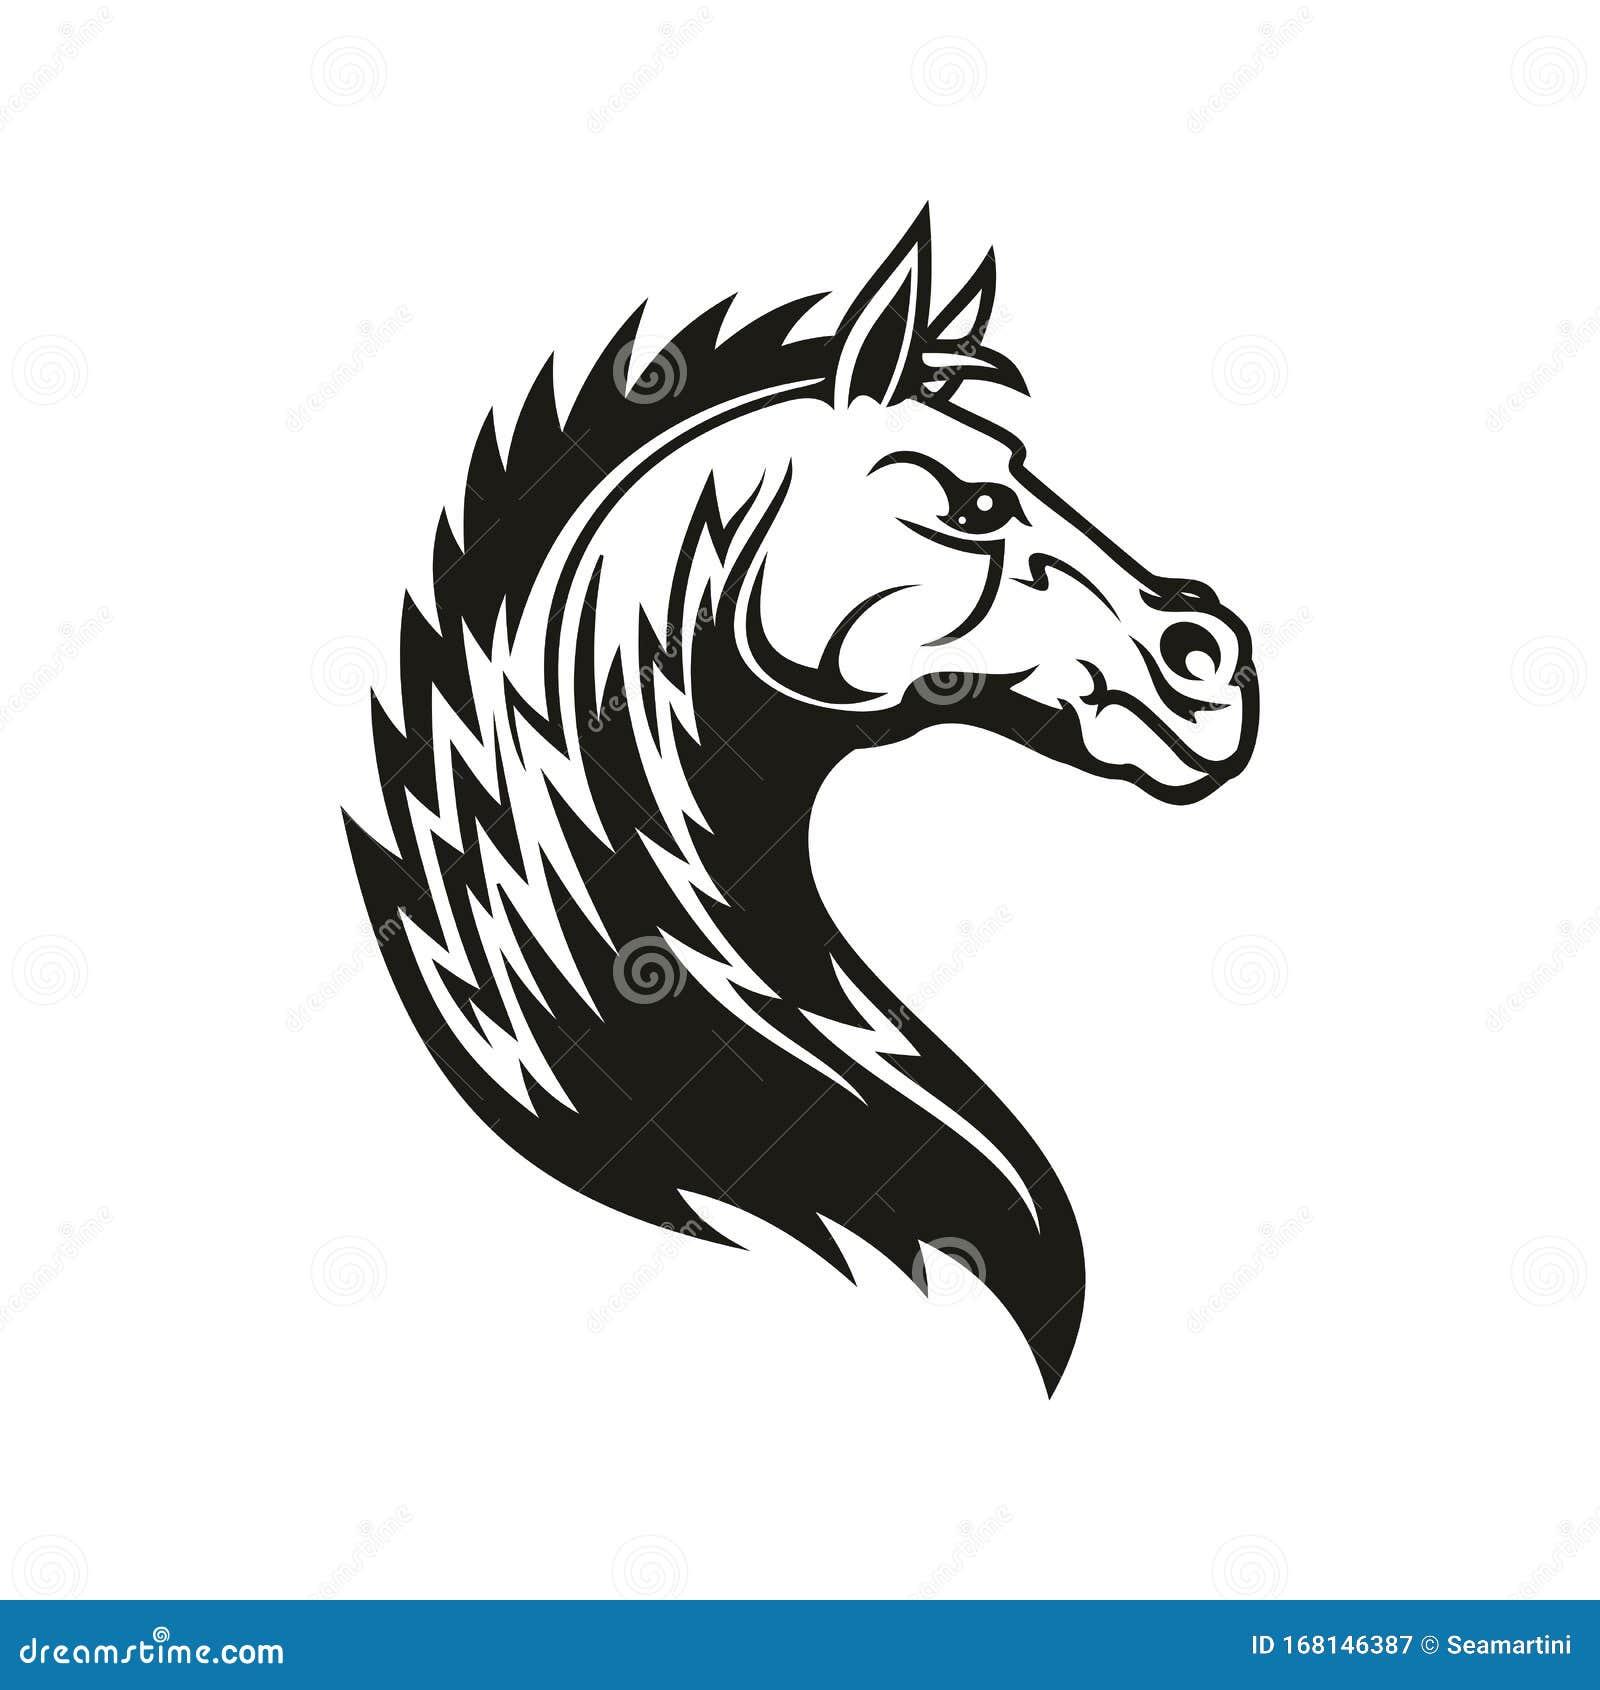 Tribal Horse Head Mascot Or Tattoo Stock Vector Illustration Of Emblem Power 168146387